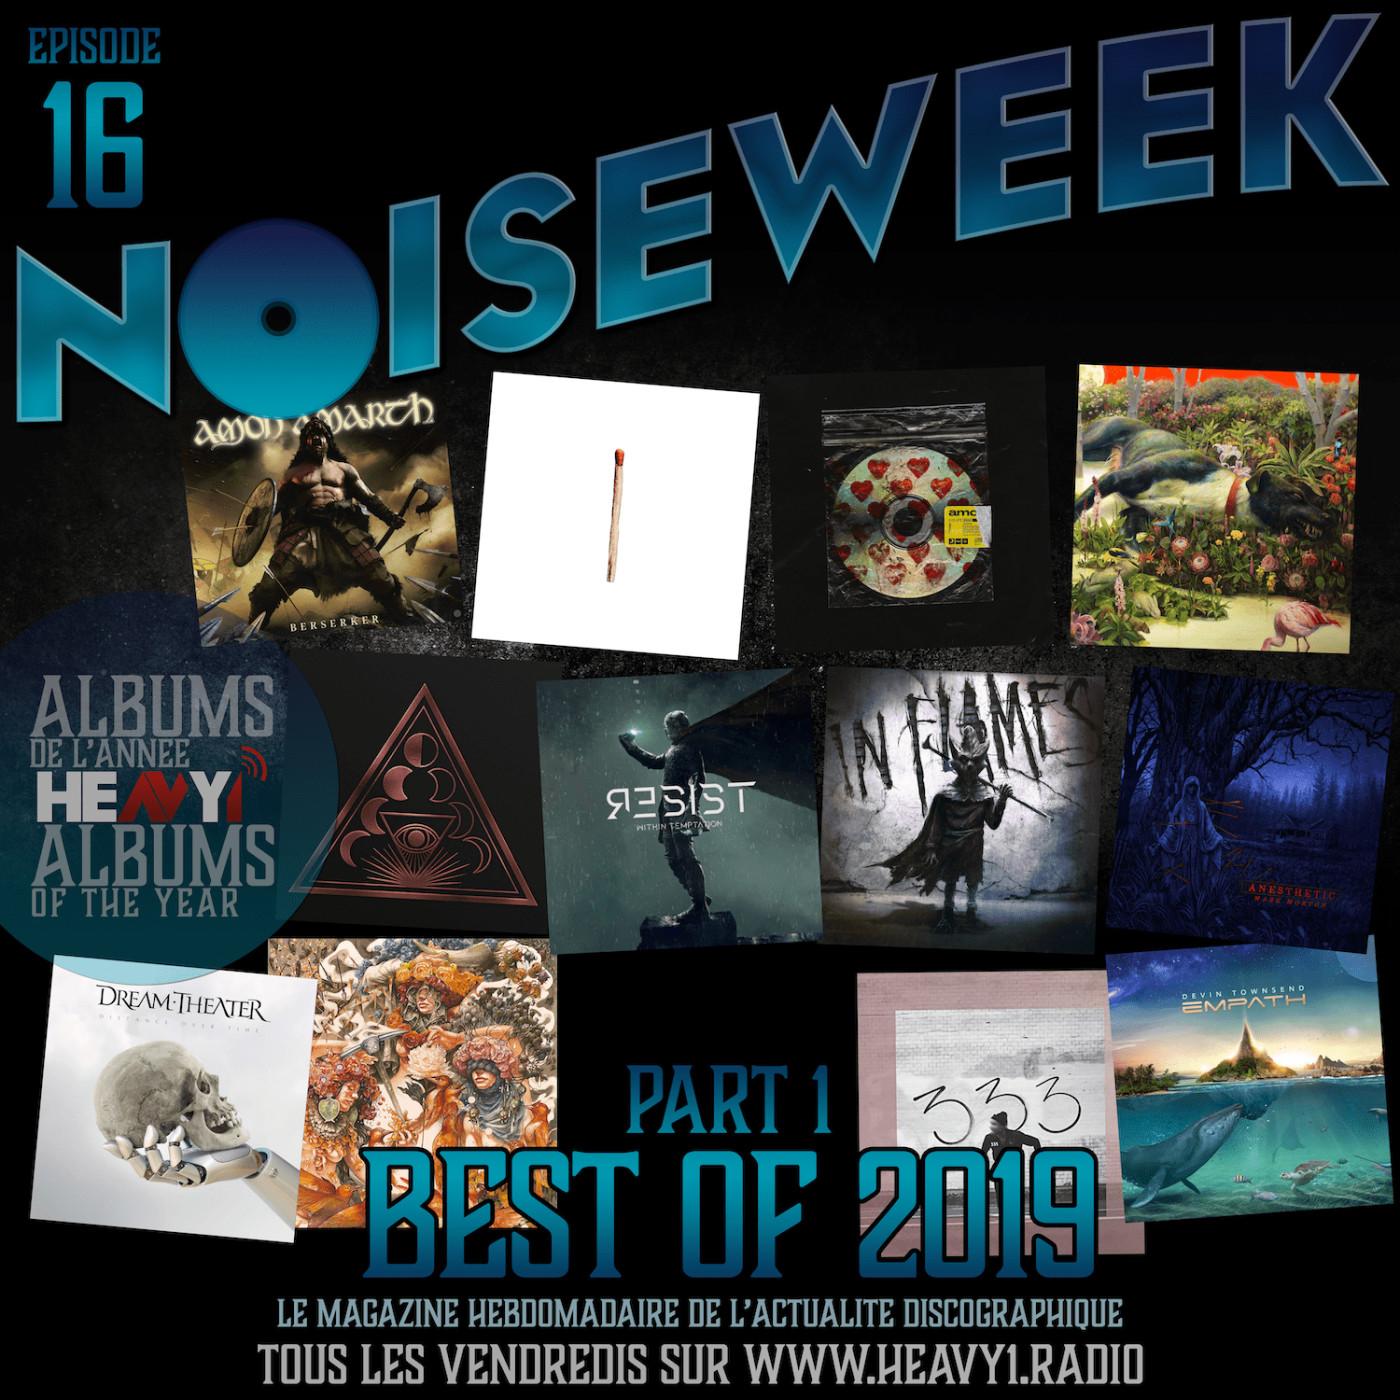 Noiseweek #16 Saison 3